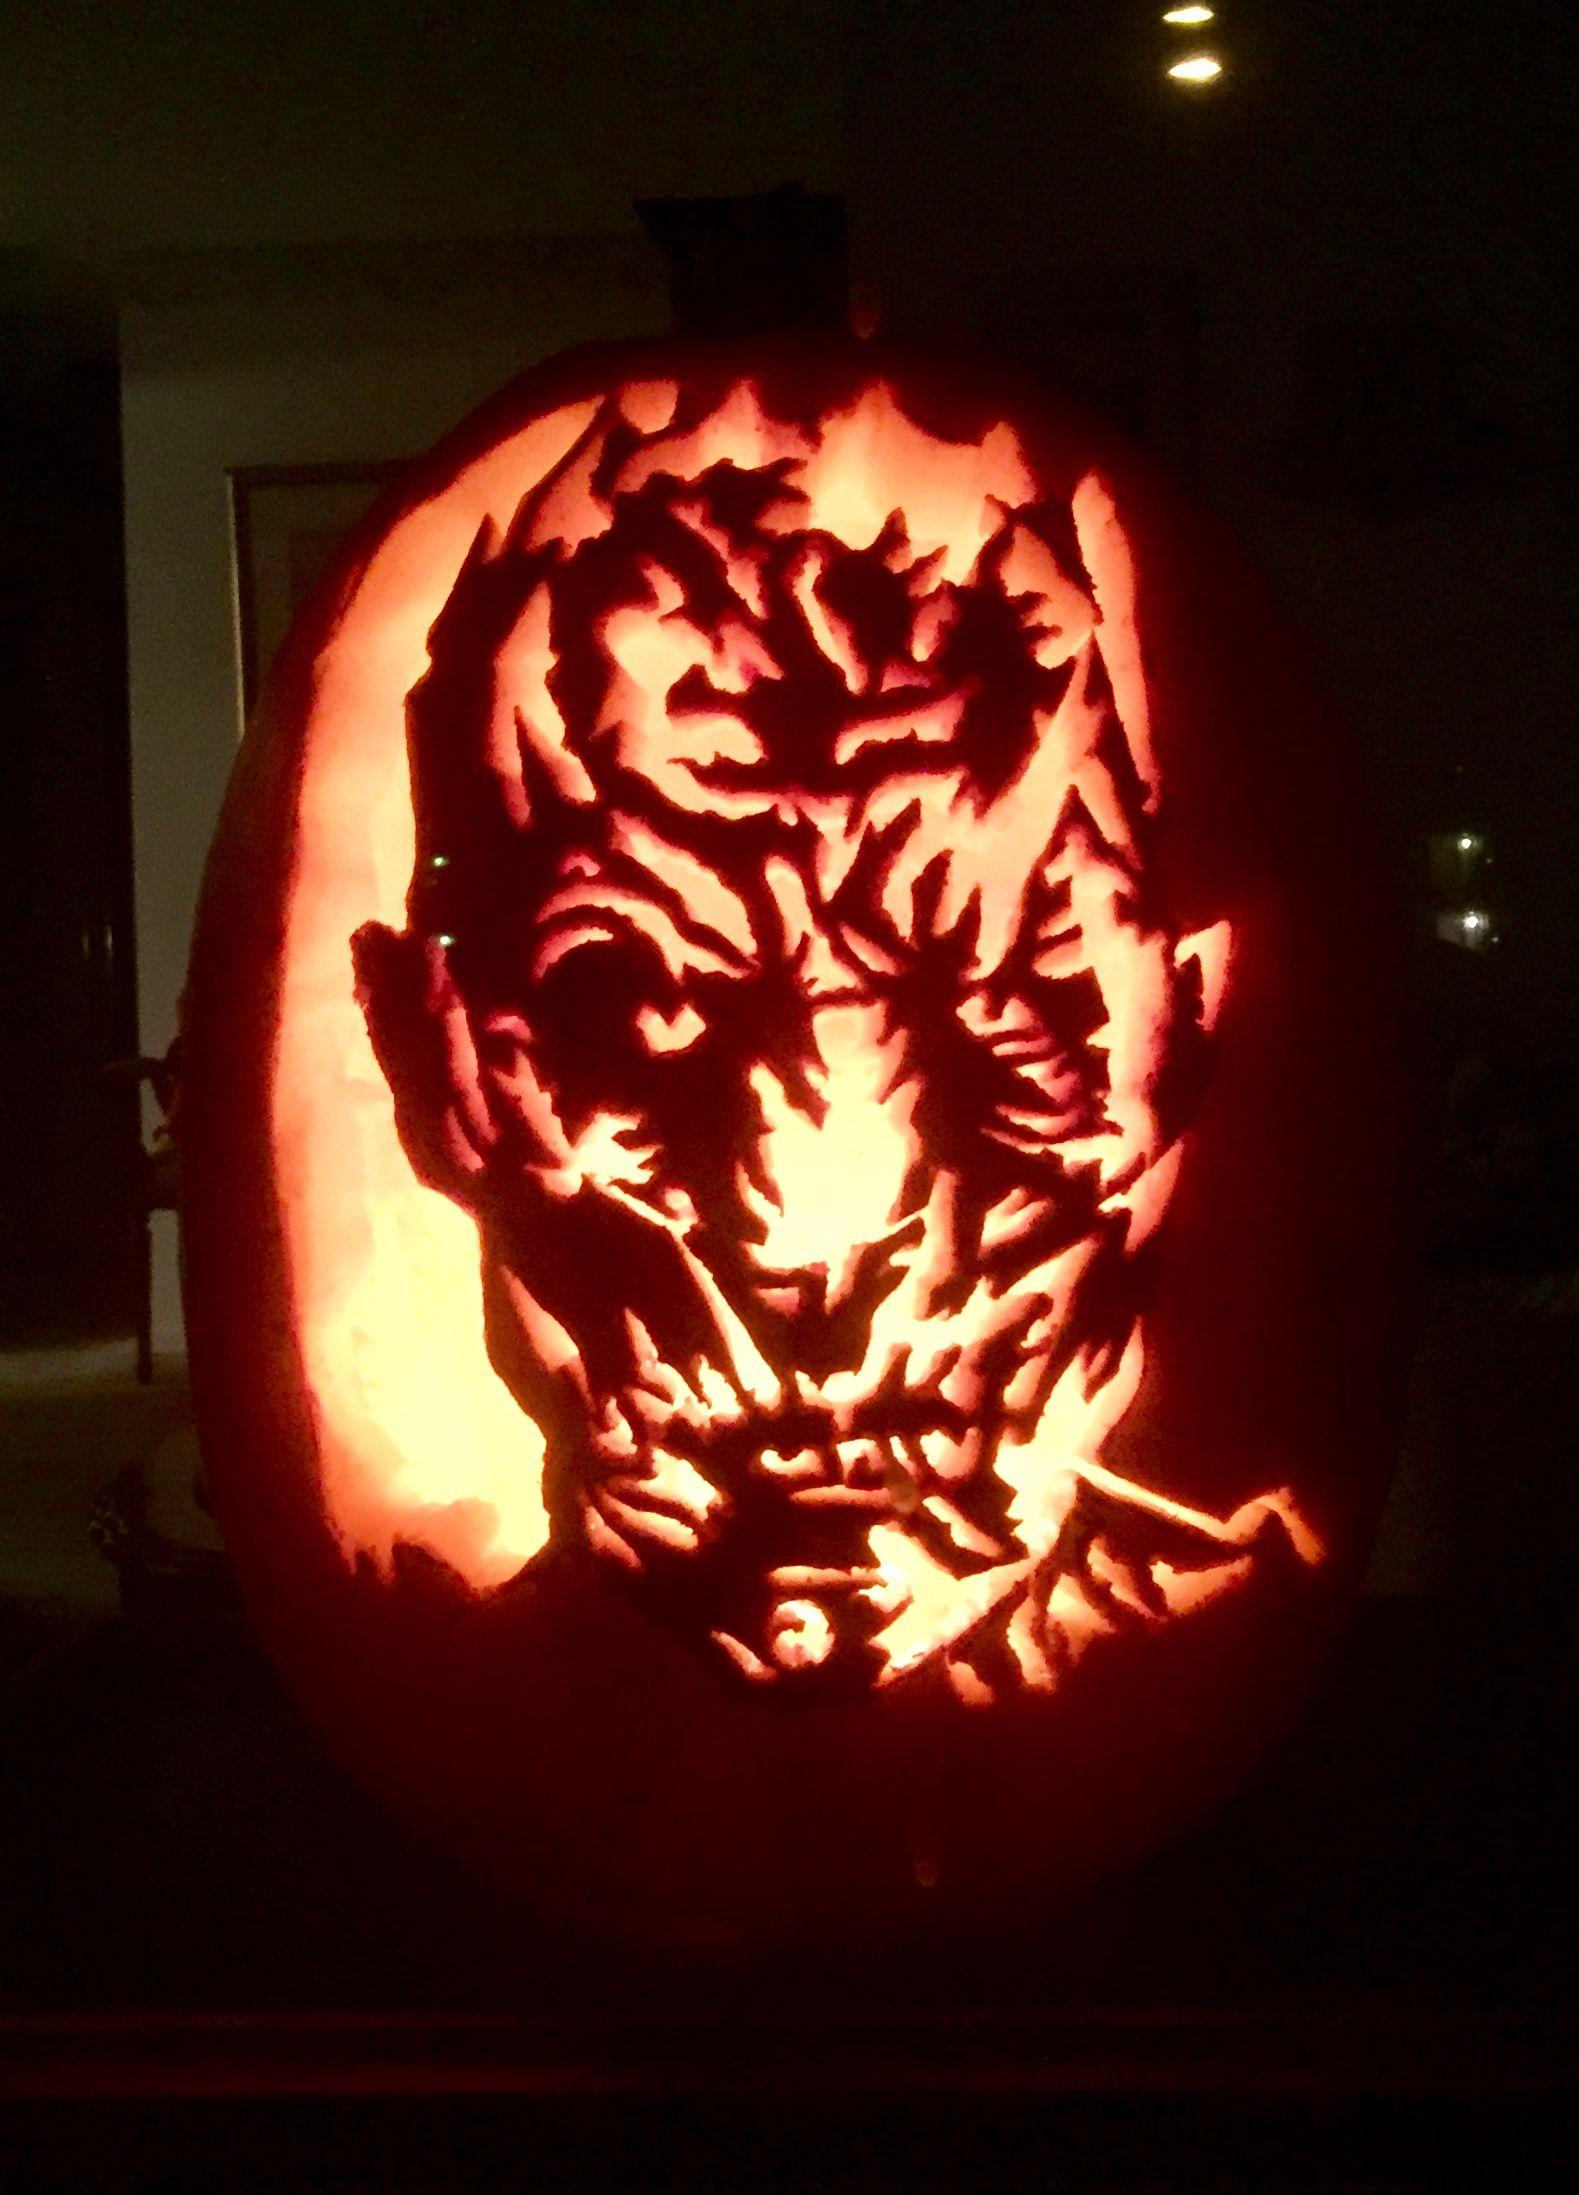 Pin By Travis S On Agordaphobia Pumpkin Carving Pumpkin Carving Games Amazing Pumpkin Carving